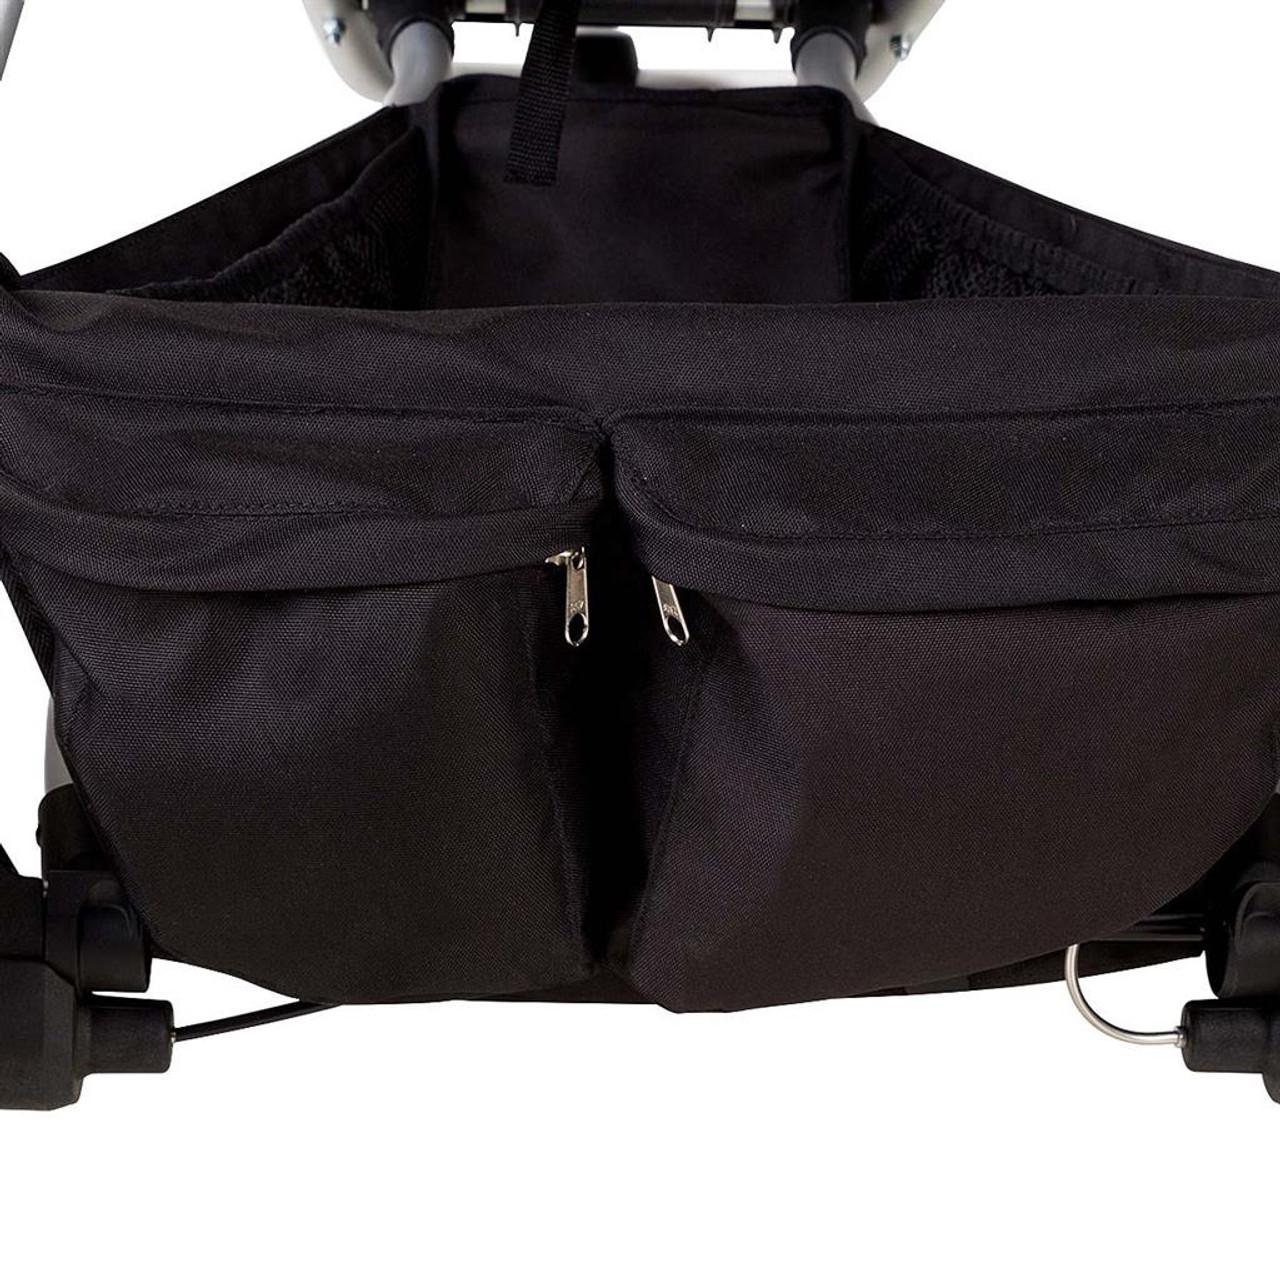 Mountain Buggy Urban Jungle Luxury Collection Herringbone | Baby Barn Discounts